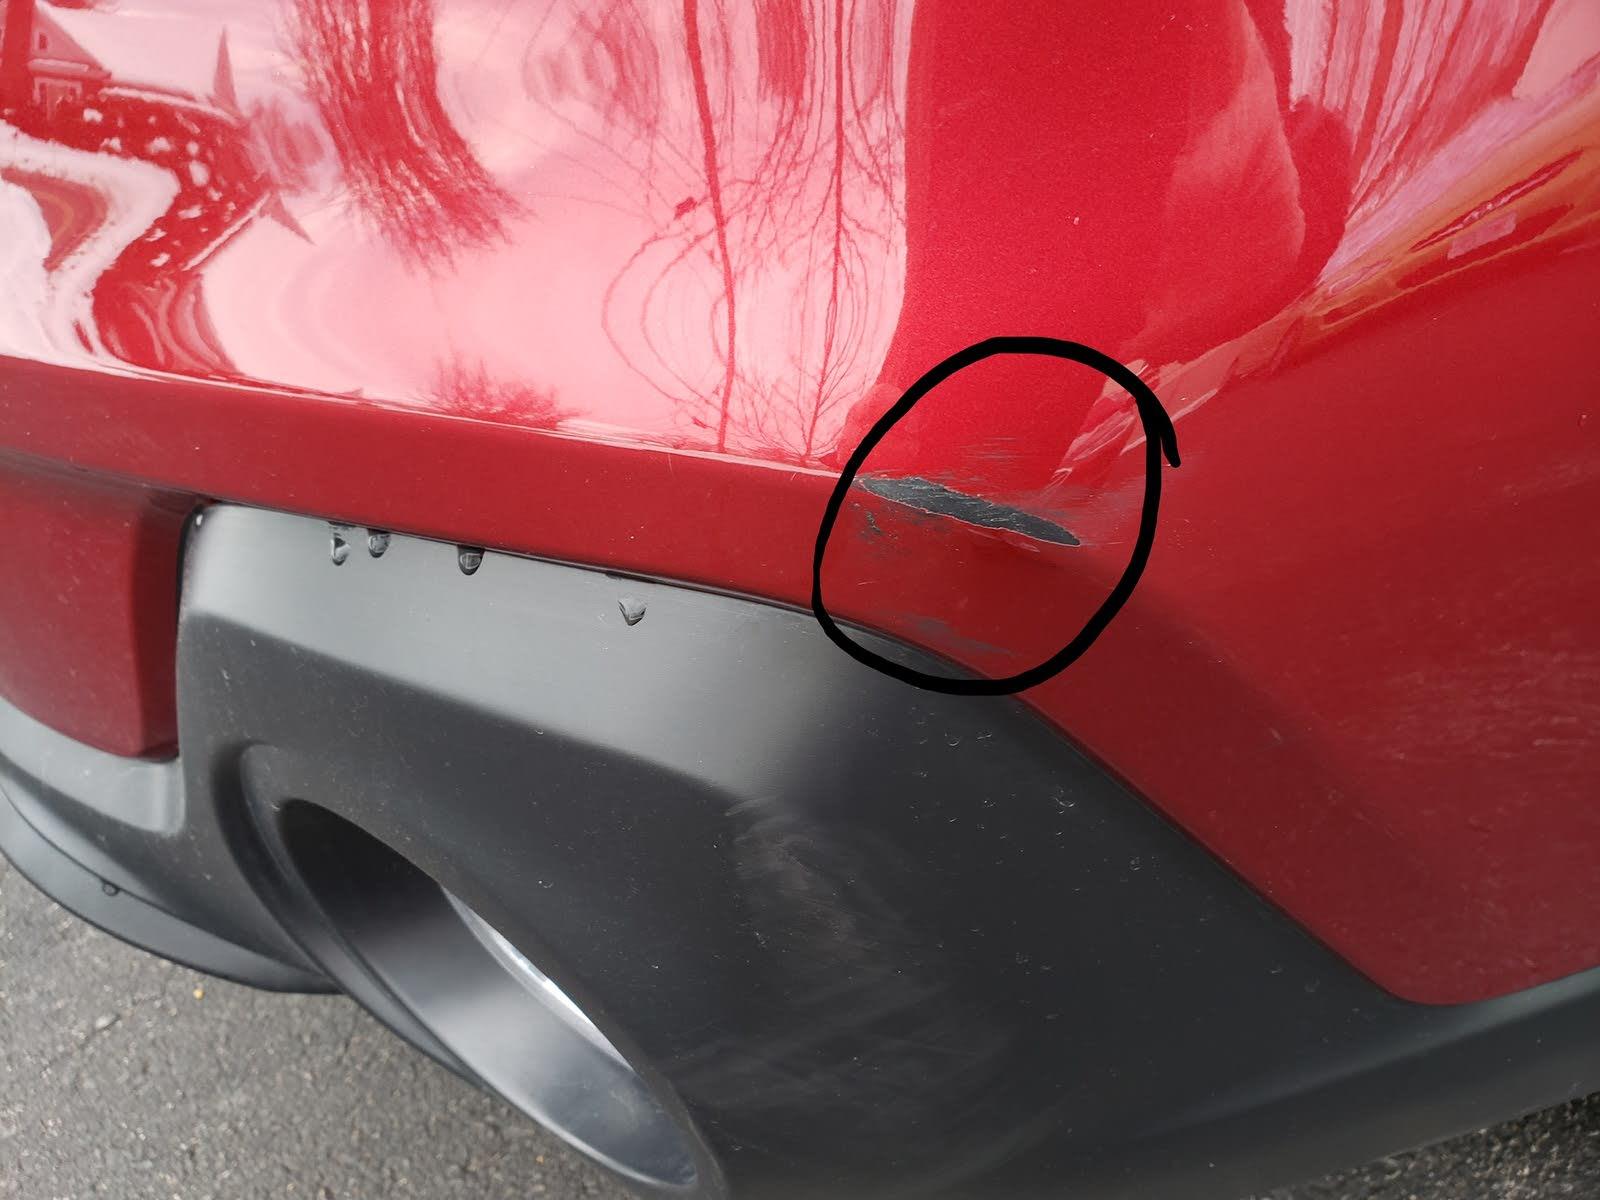 Subaru Outback Questions - EXTERIOR PAINT - CarGurus